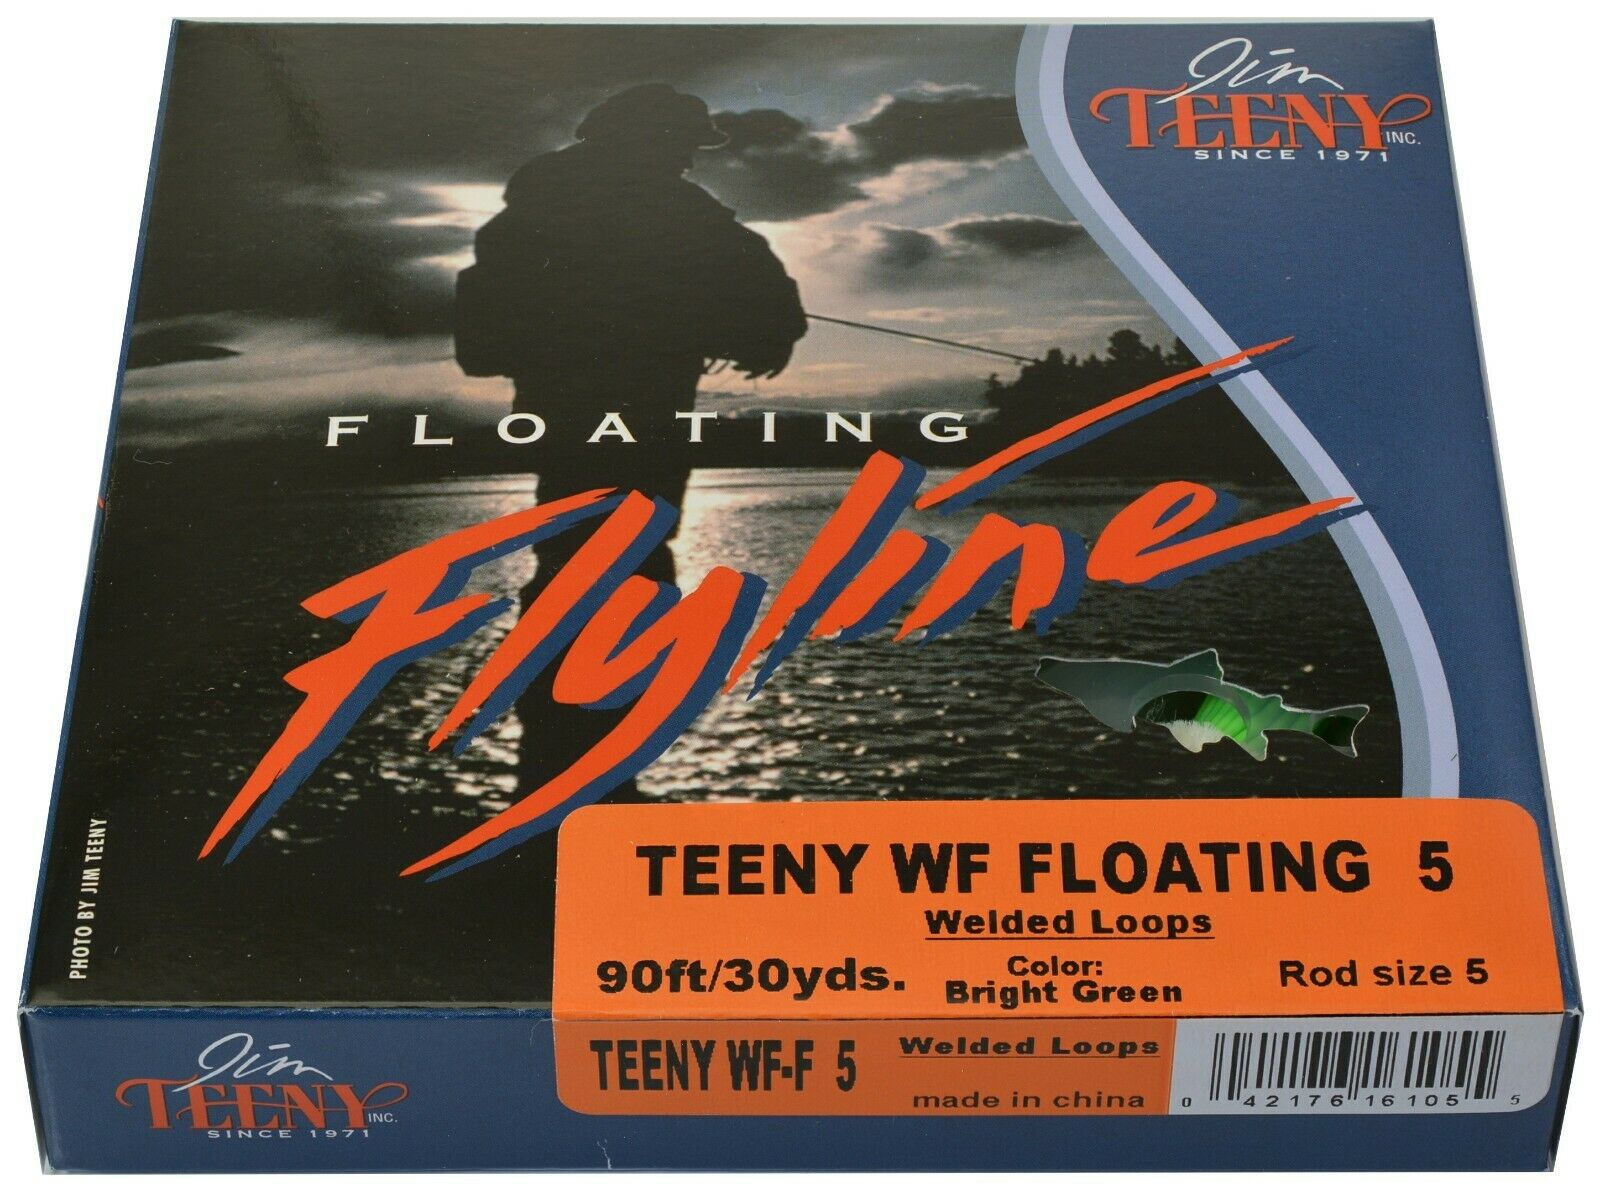 Jim Teeny Floating Fly Line  Weight Forward 5WT 90' Welded Loops Bright verde